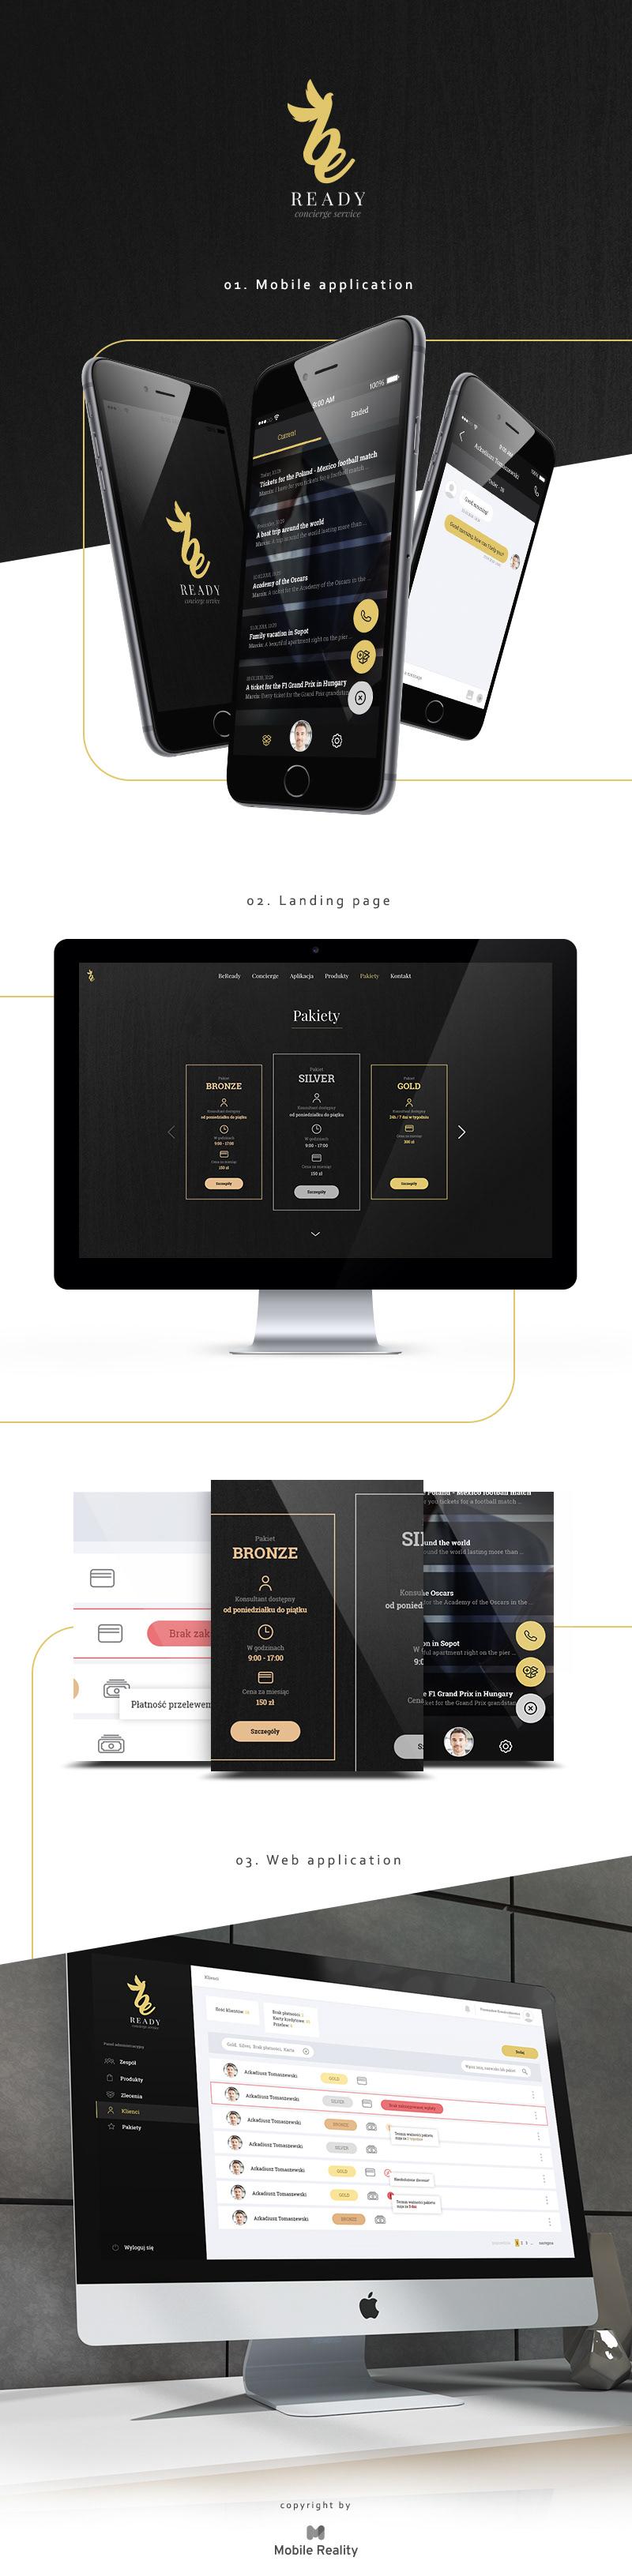 ui design Mobile Application design app mobile Web